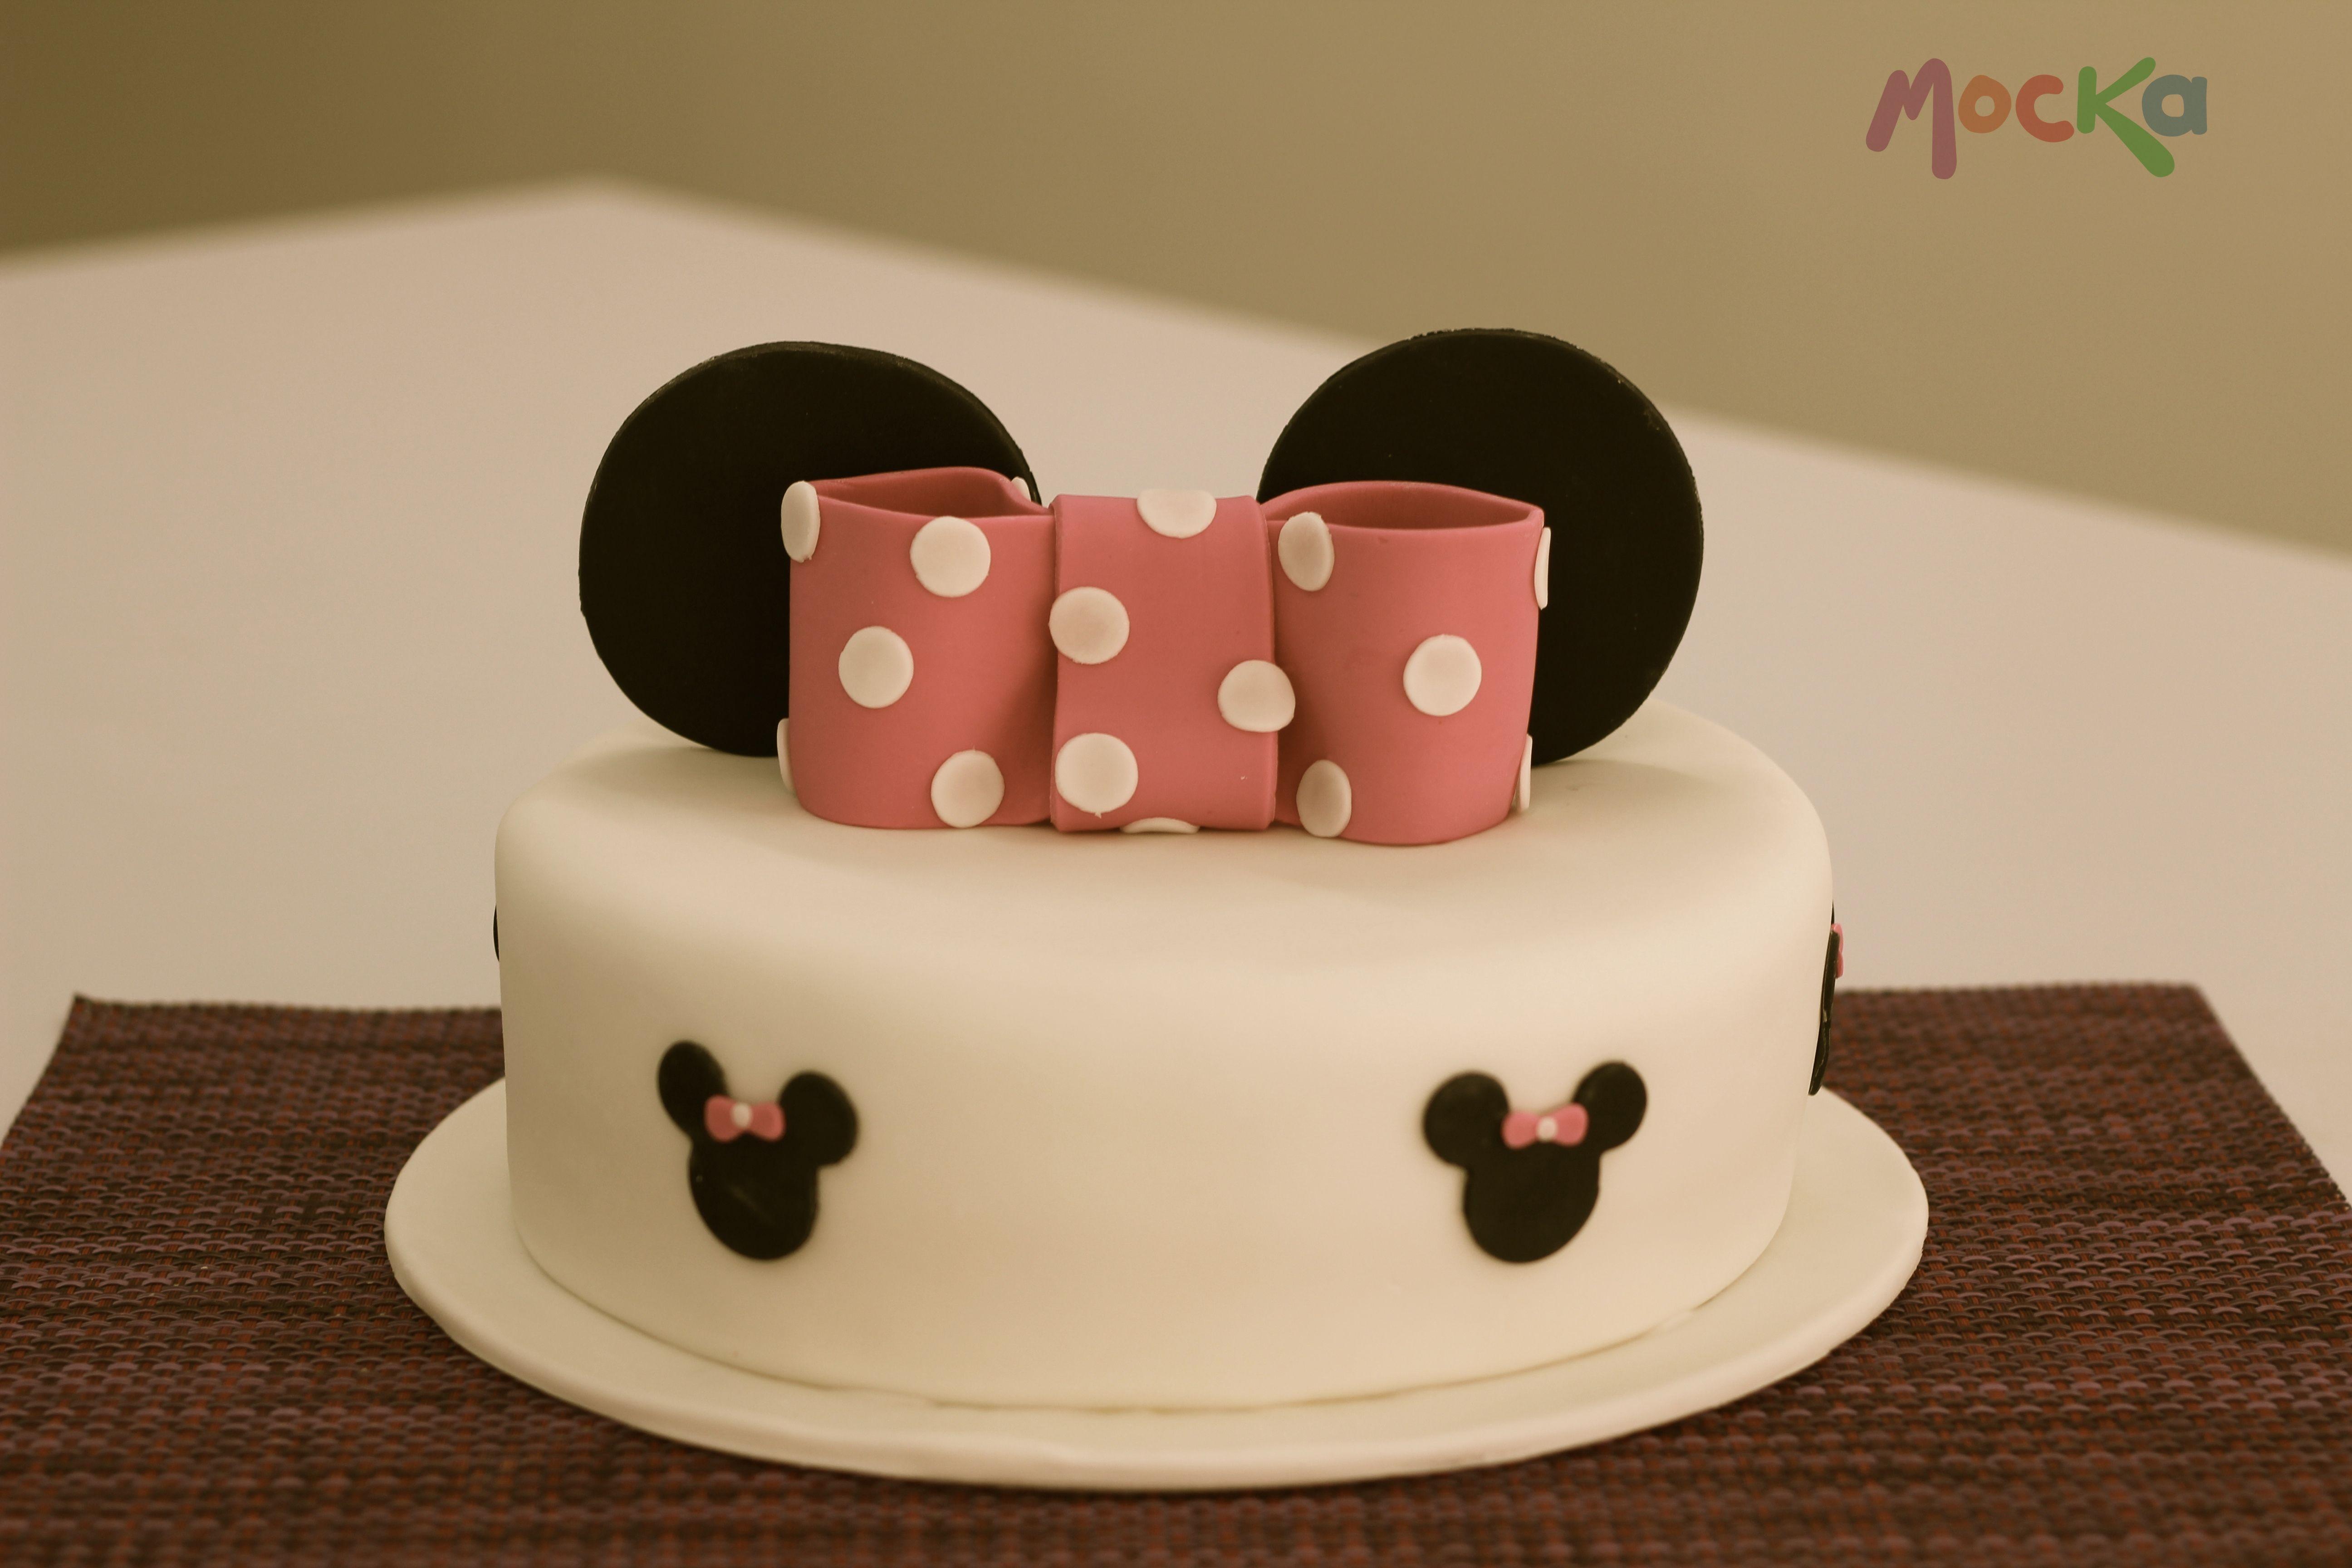 #Ponque de #Minnie. Les gusta?  www.mocka.co  #mocka #pasteleria #cakeshop #cake #minniemouse #disney #disneycakes #birthdaycakes #ponquescumpleaños #tortascumpleaños #torta #pastel #pudin